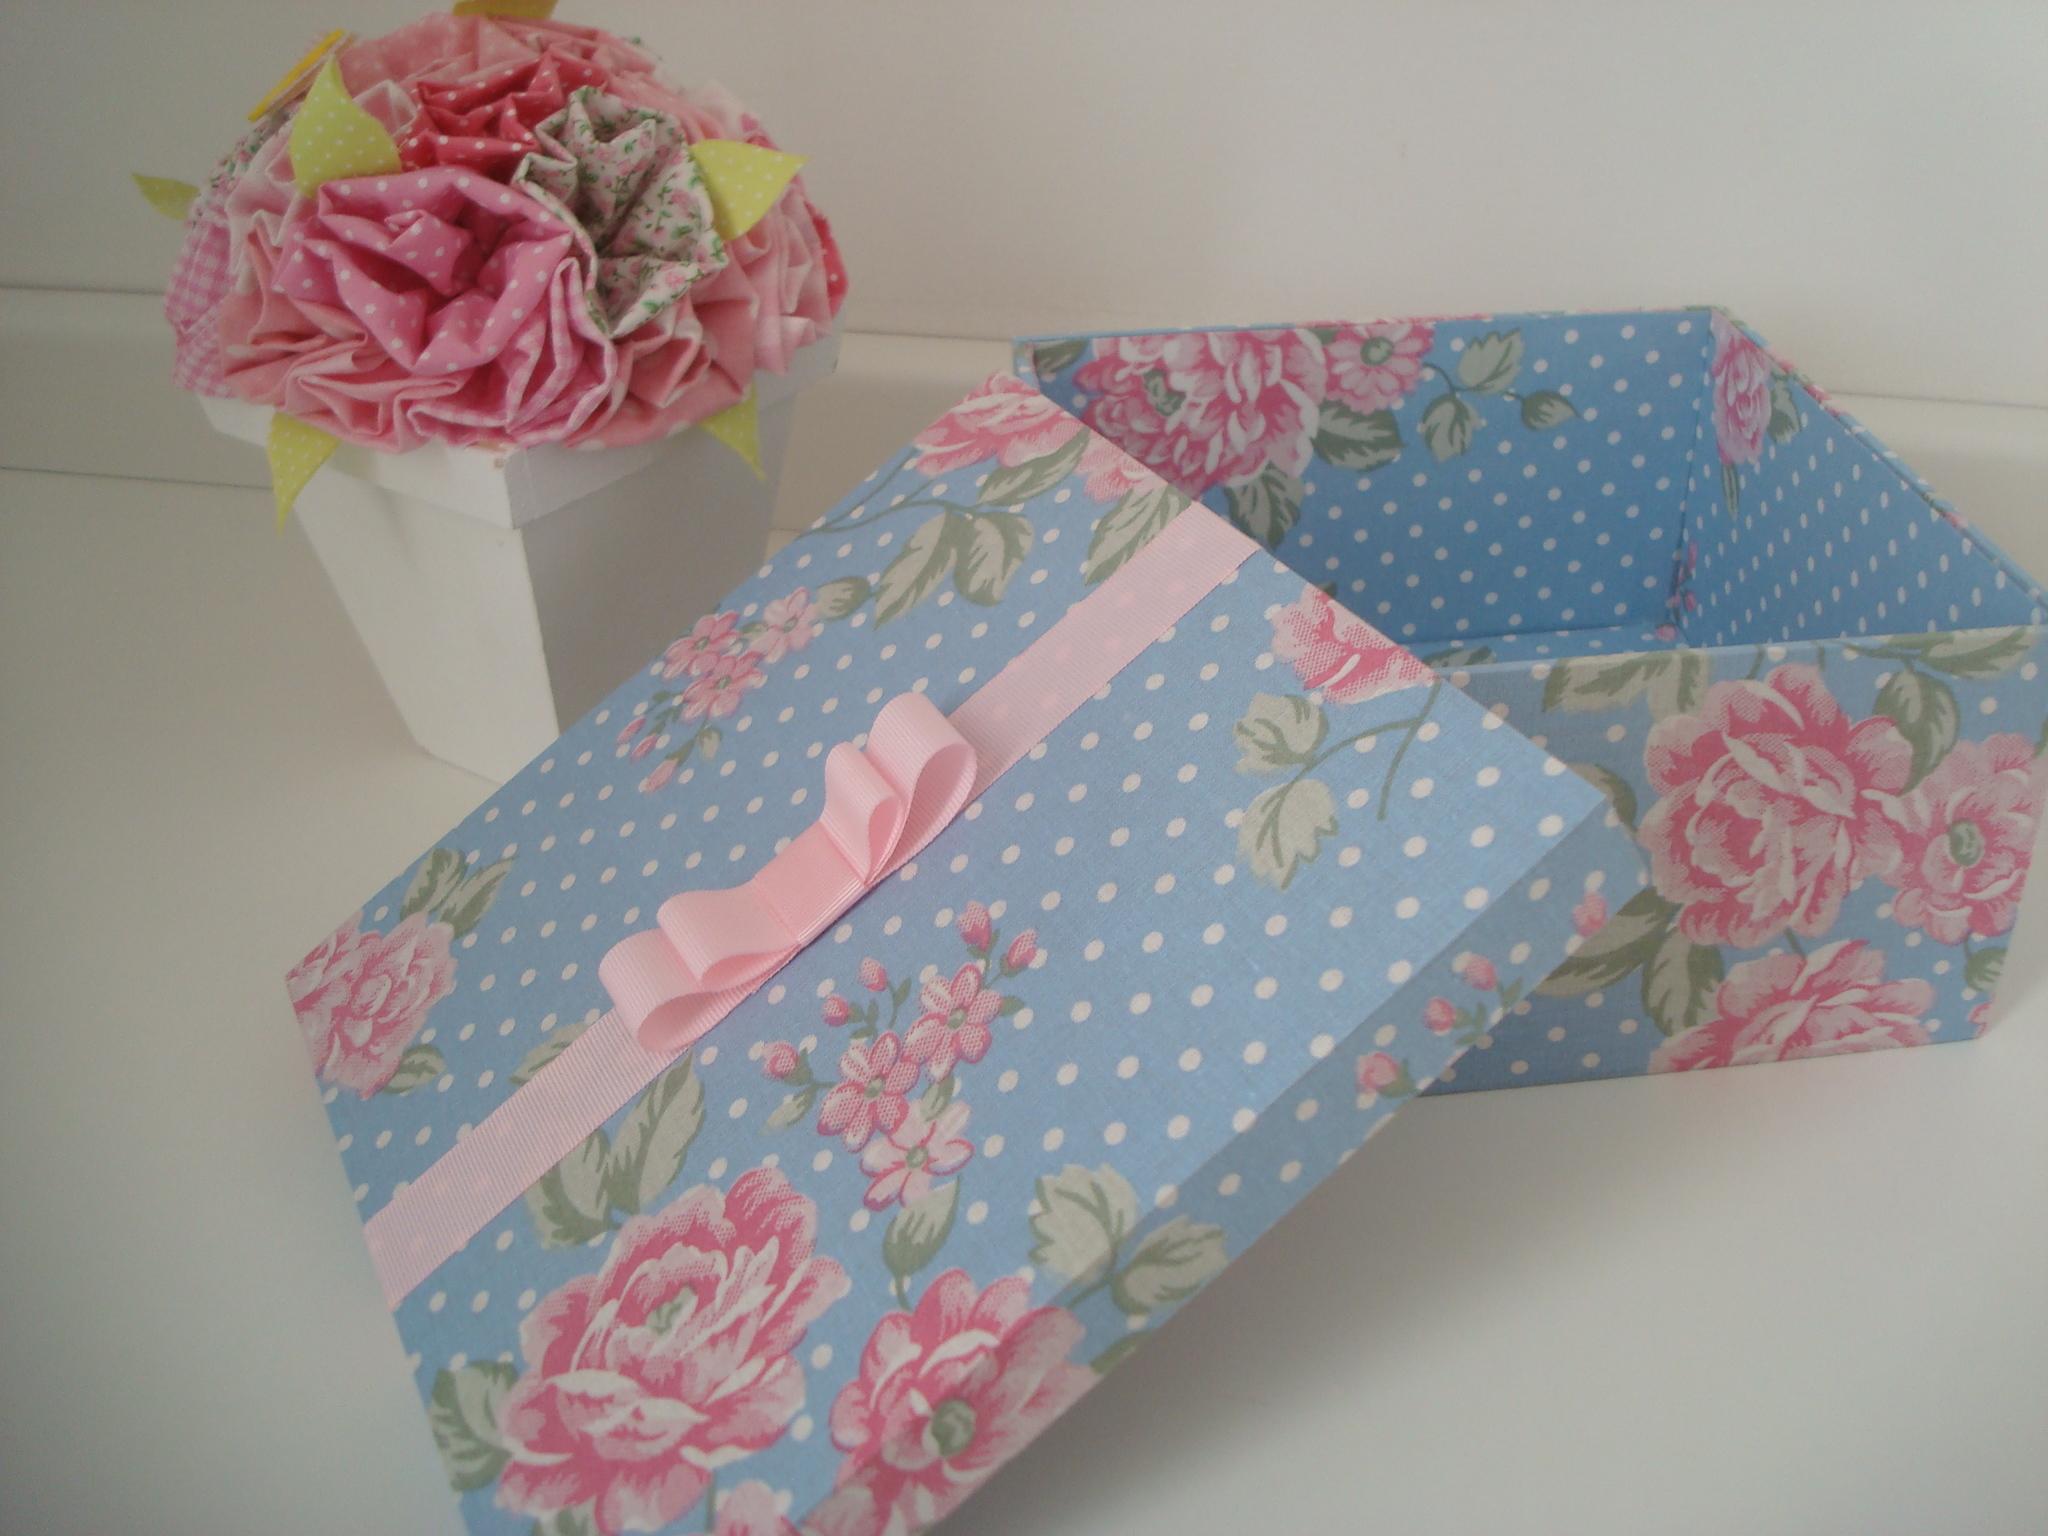 caixa forrada com tecido caixa forrada com tecido caixa forrada com  #83333A 2048x1536